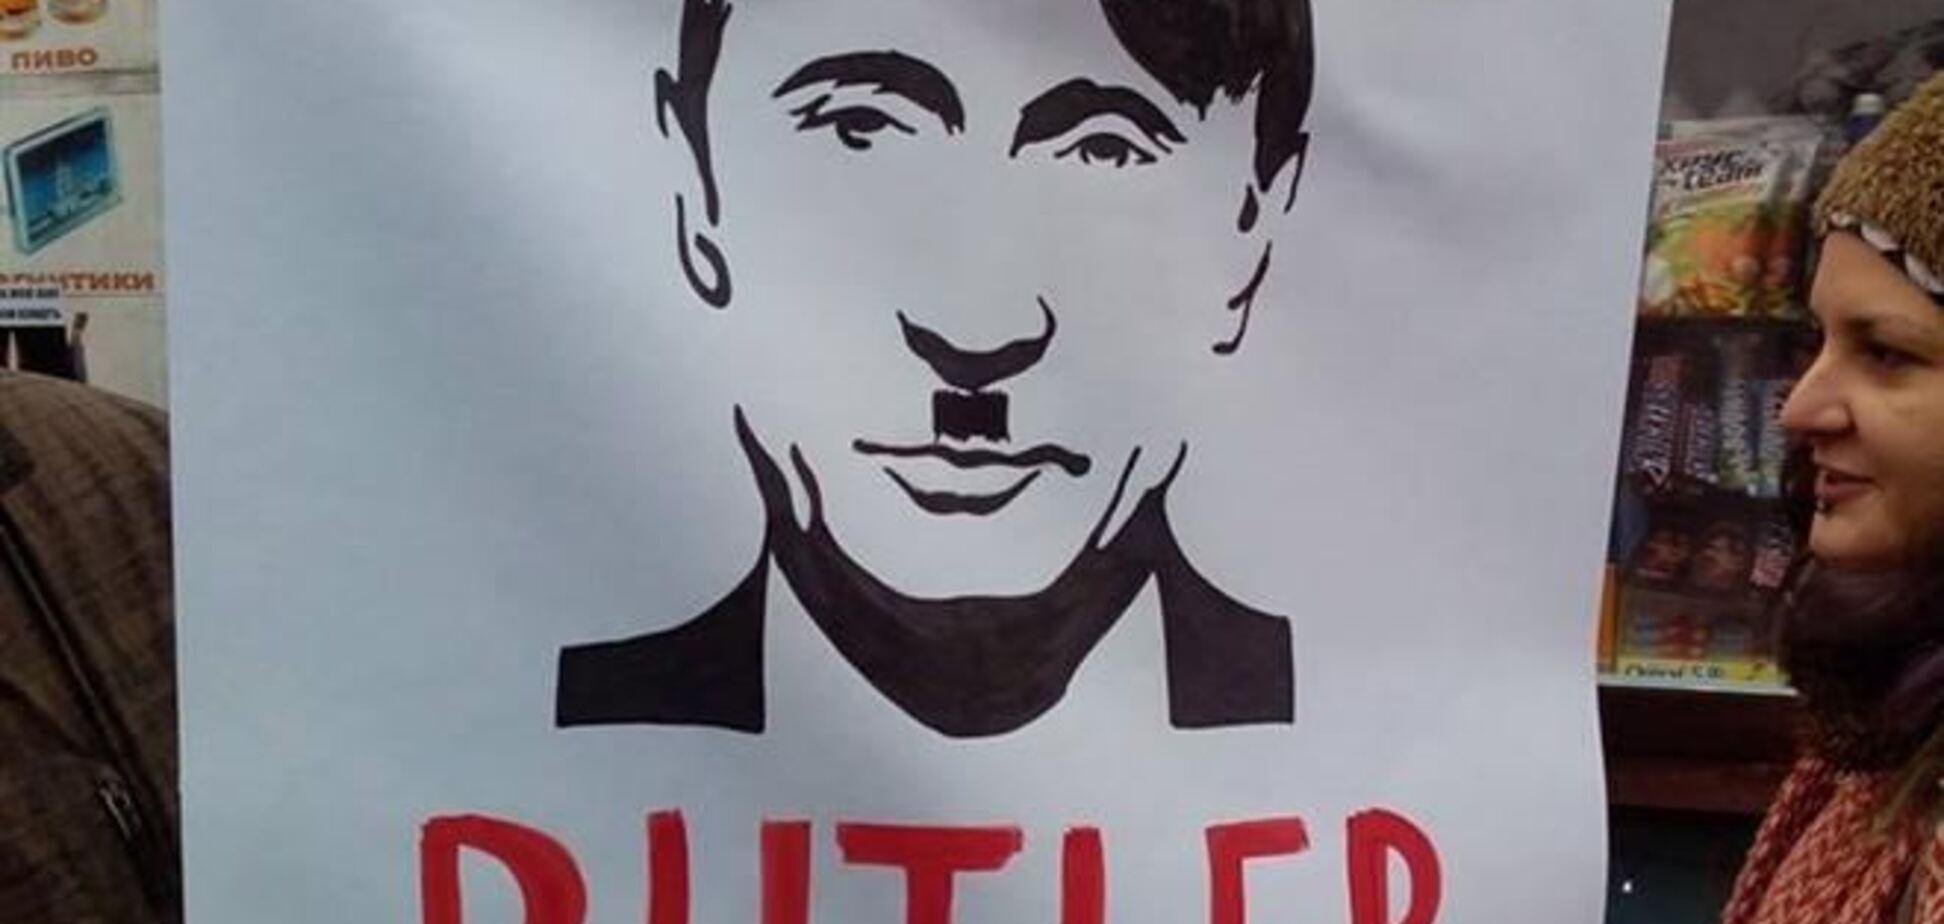 Участники веча на Майдане сравнили Путина с Гитлером